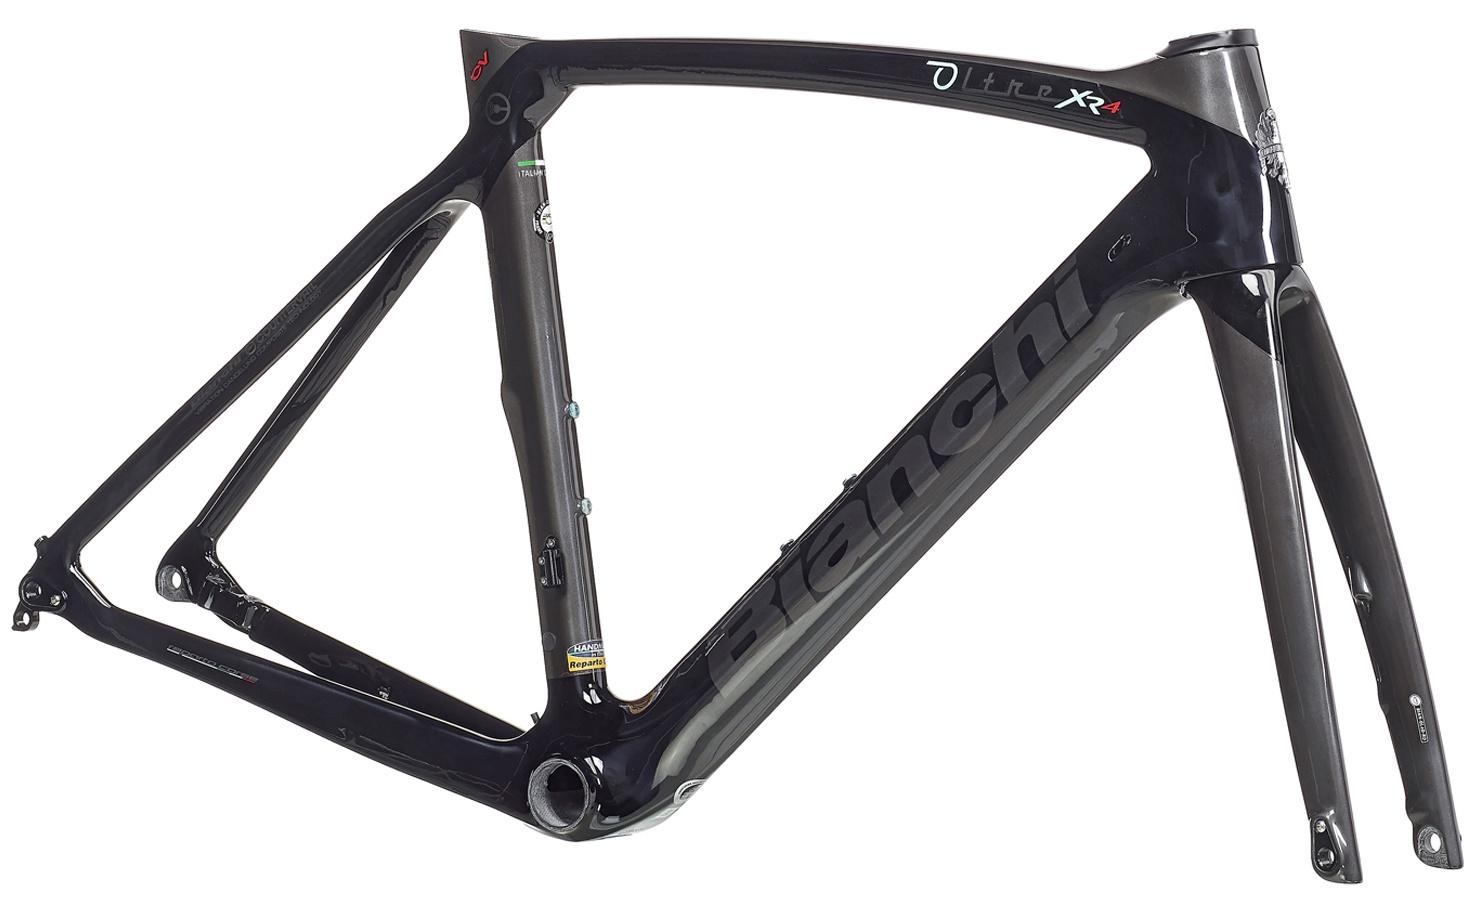 Bianchi Oltre XR4 CV Disc Rammekit 2021 - Sort  »  Bike Size: 53cm